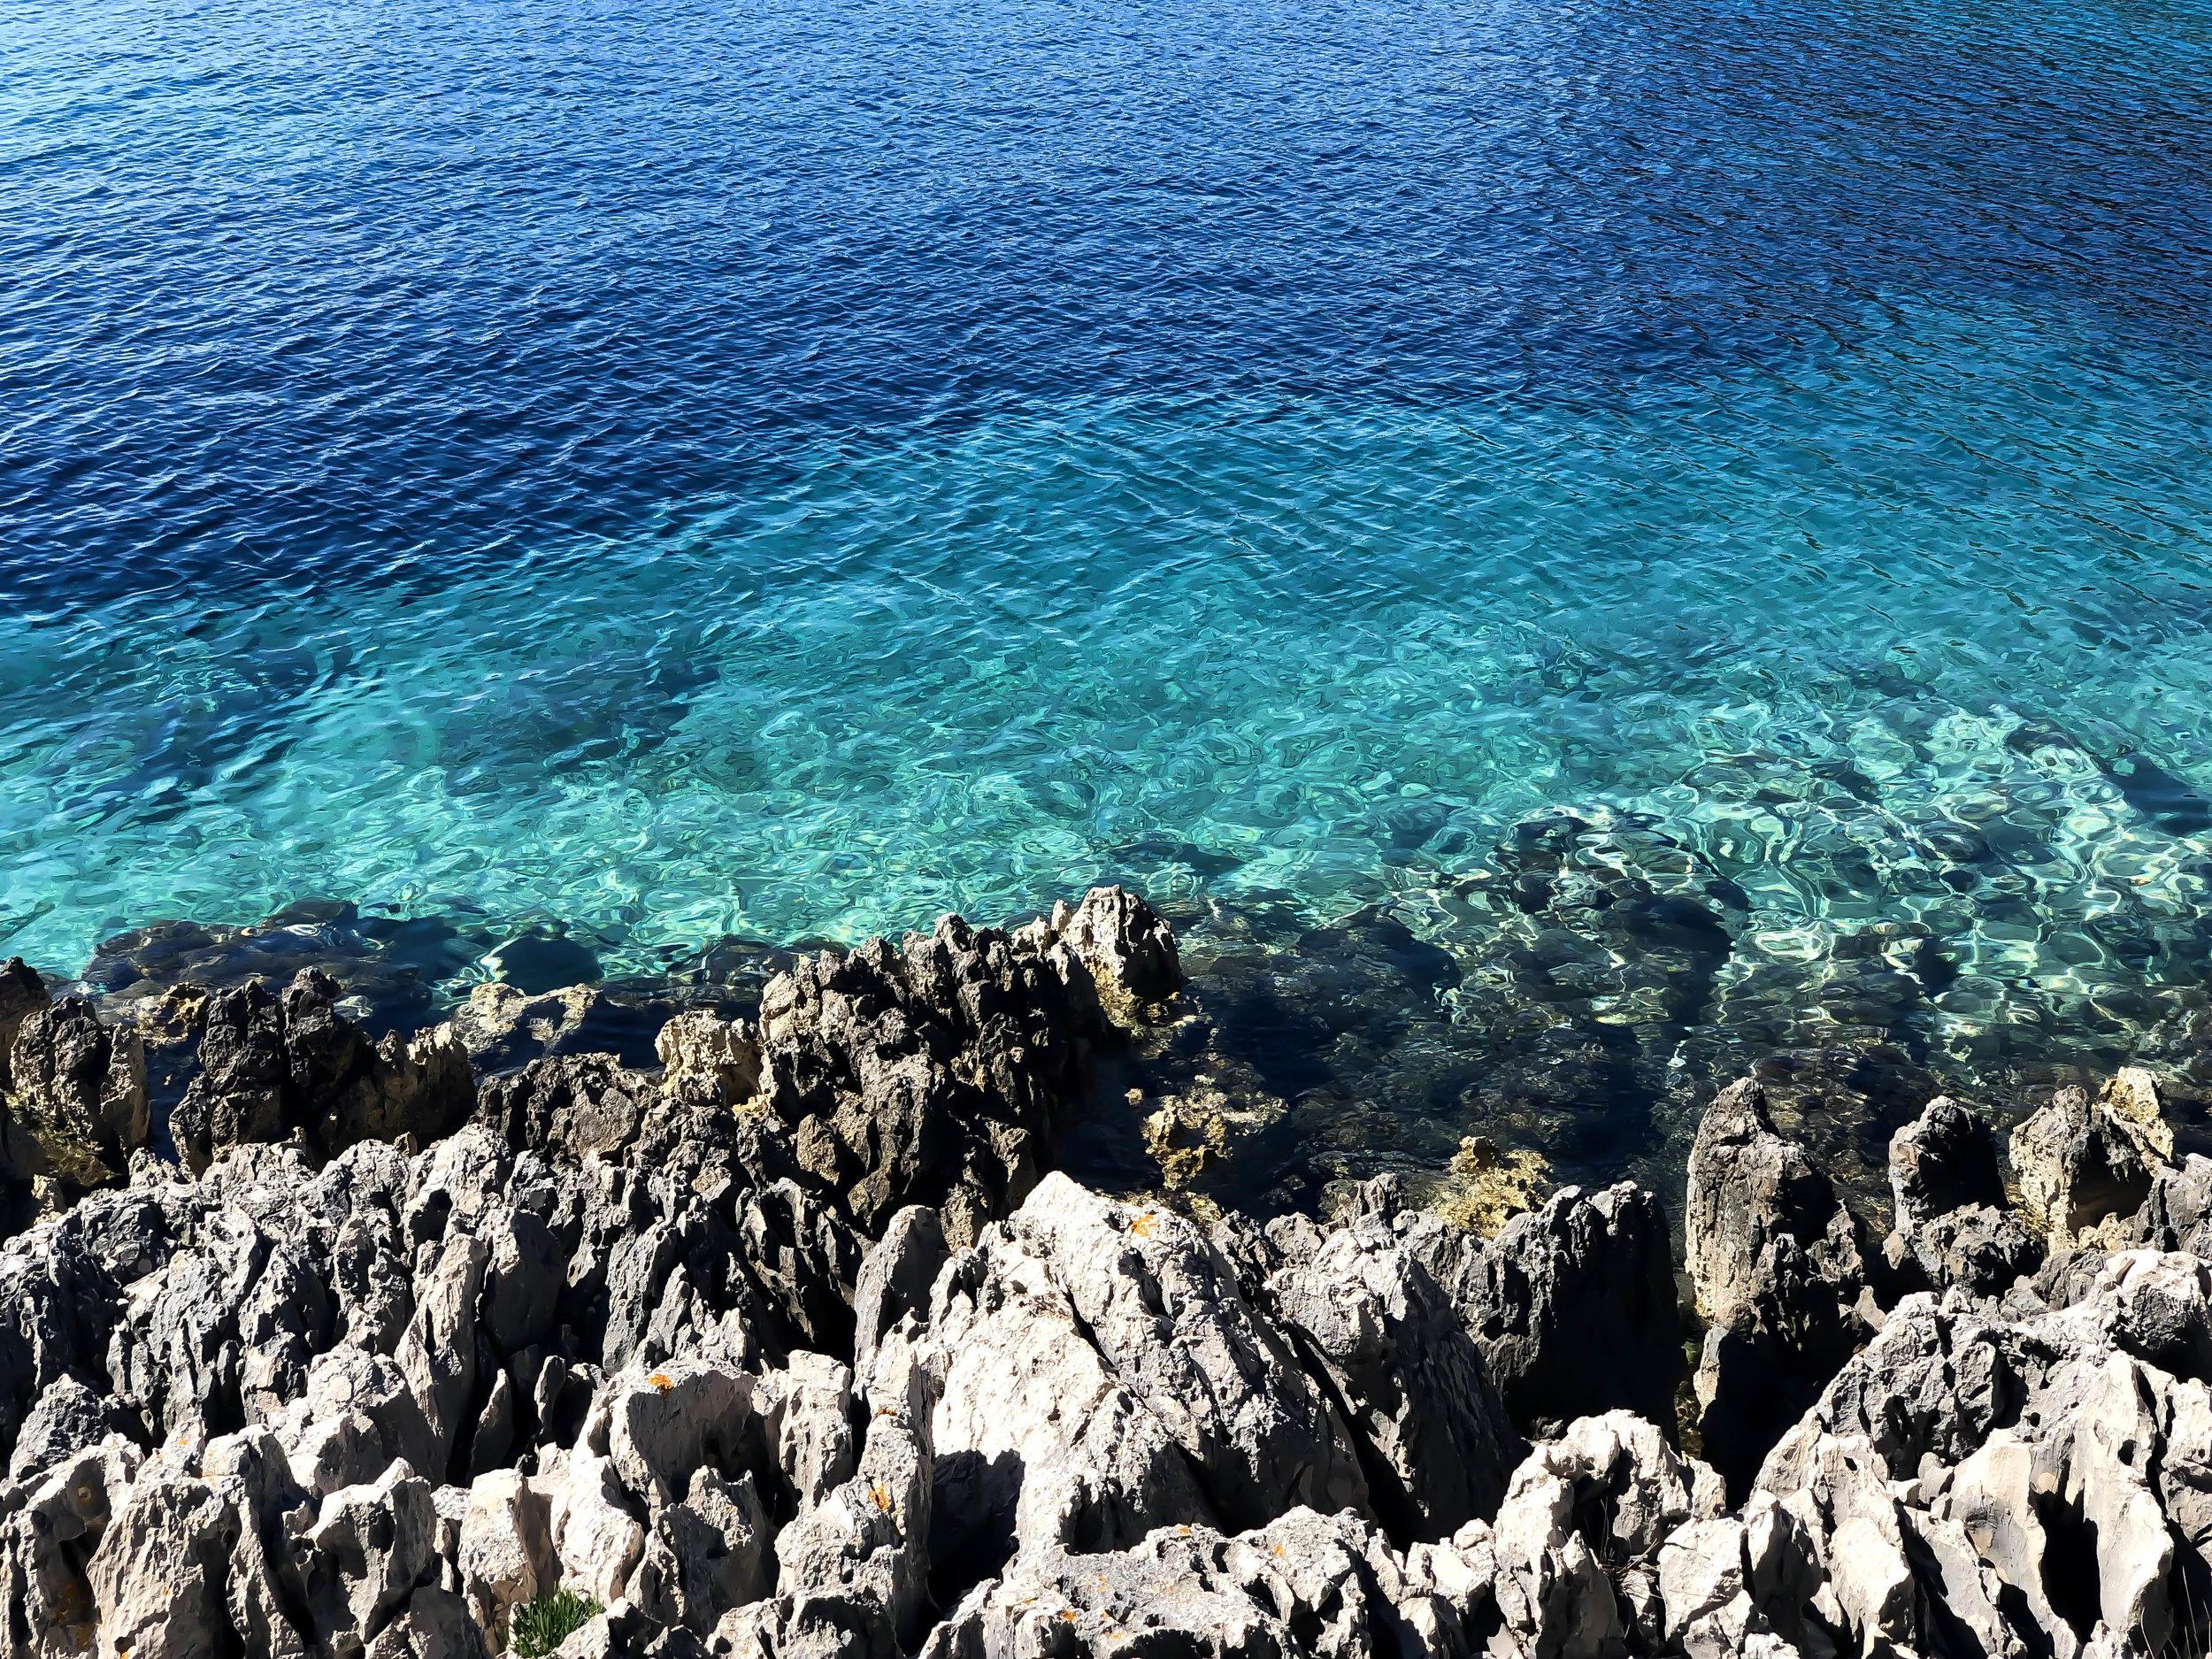 The Adriatric Sea in Lôsinj, Croatia.